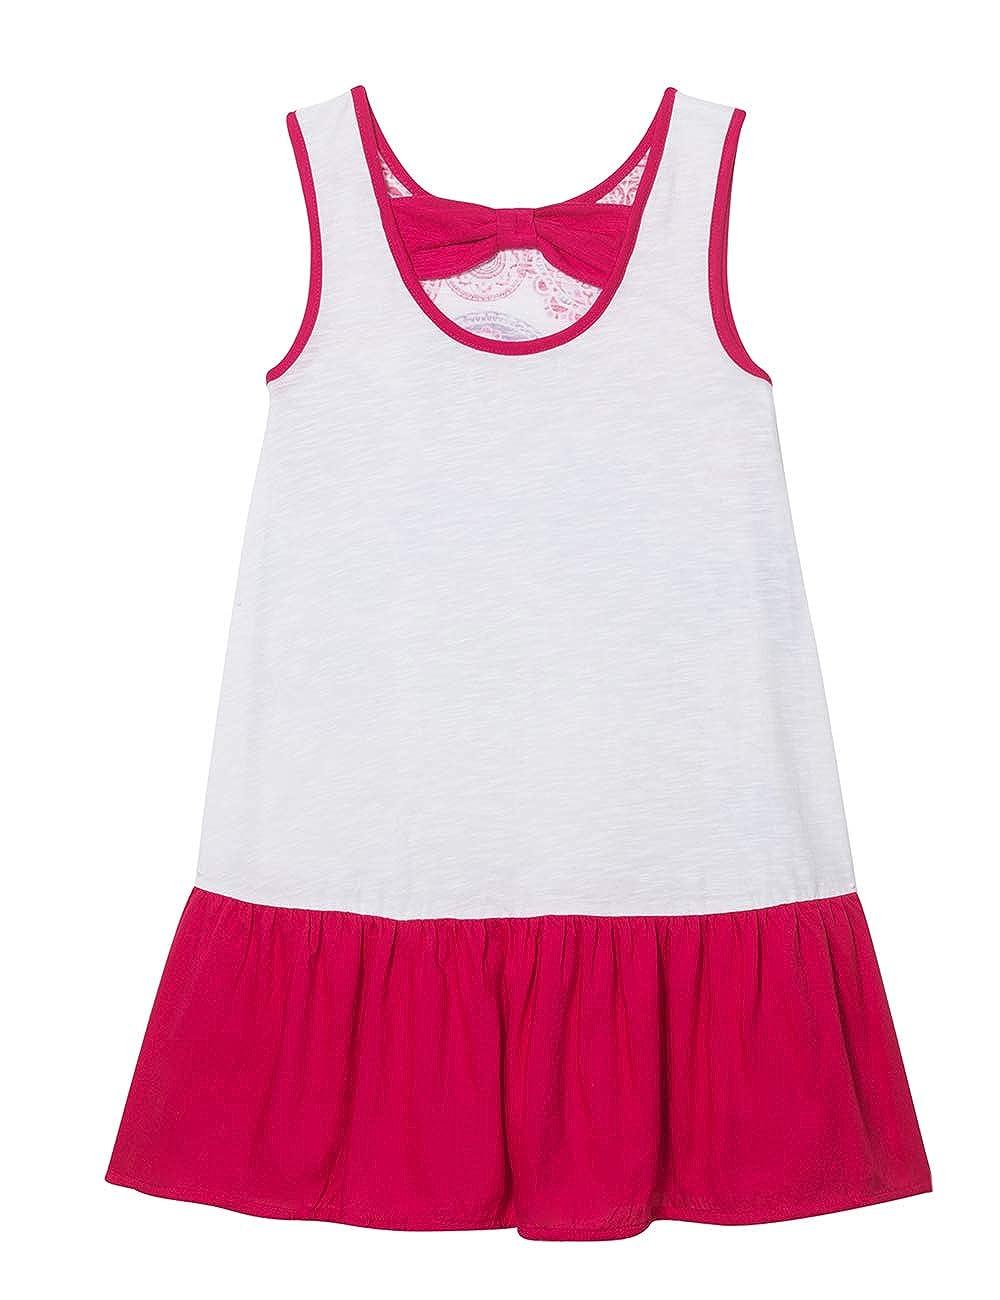 Vestito Bambina Desigual Girl Knit Dress Sleeveless Vest/_argel